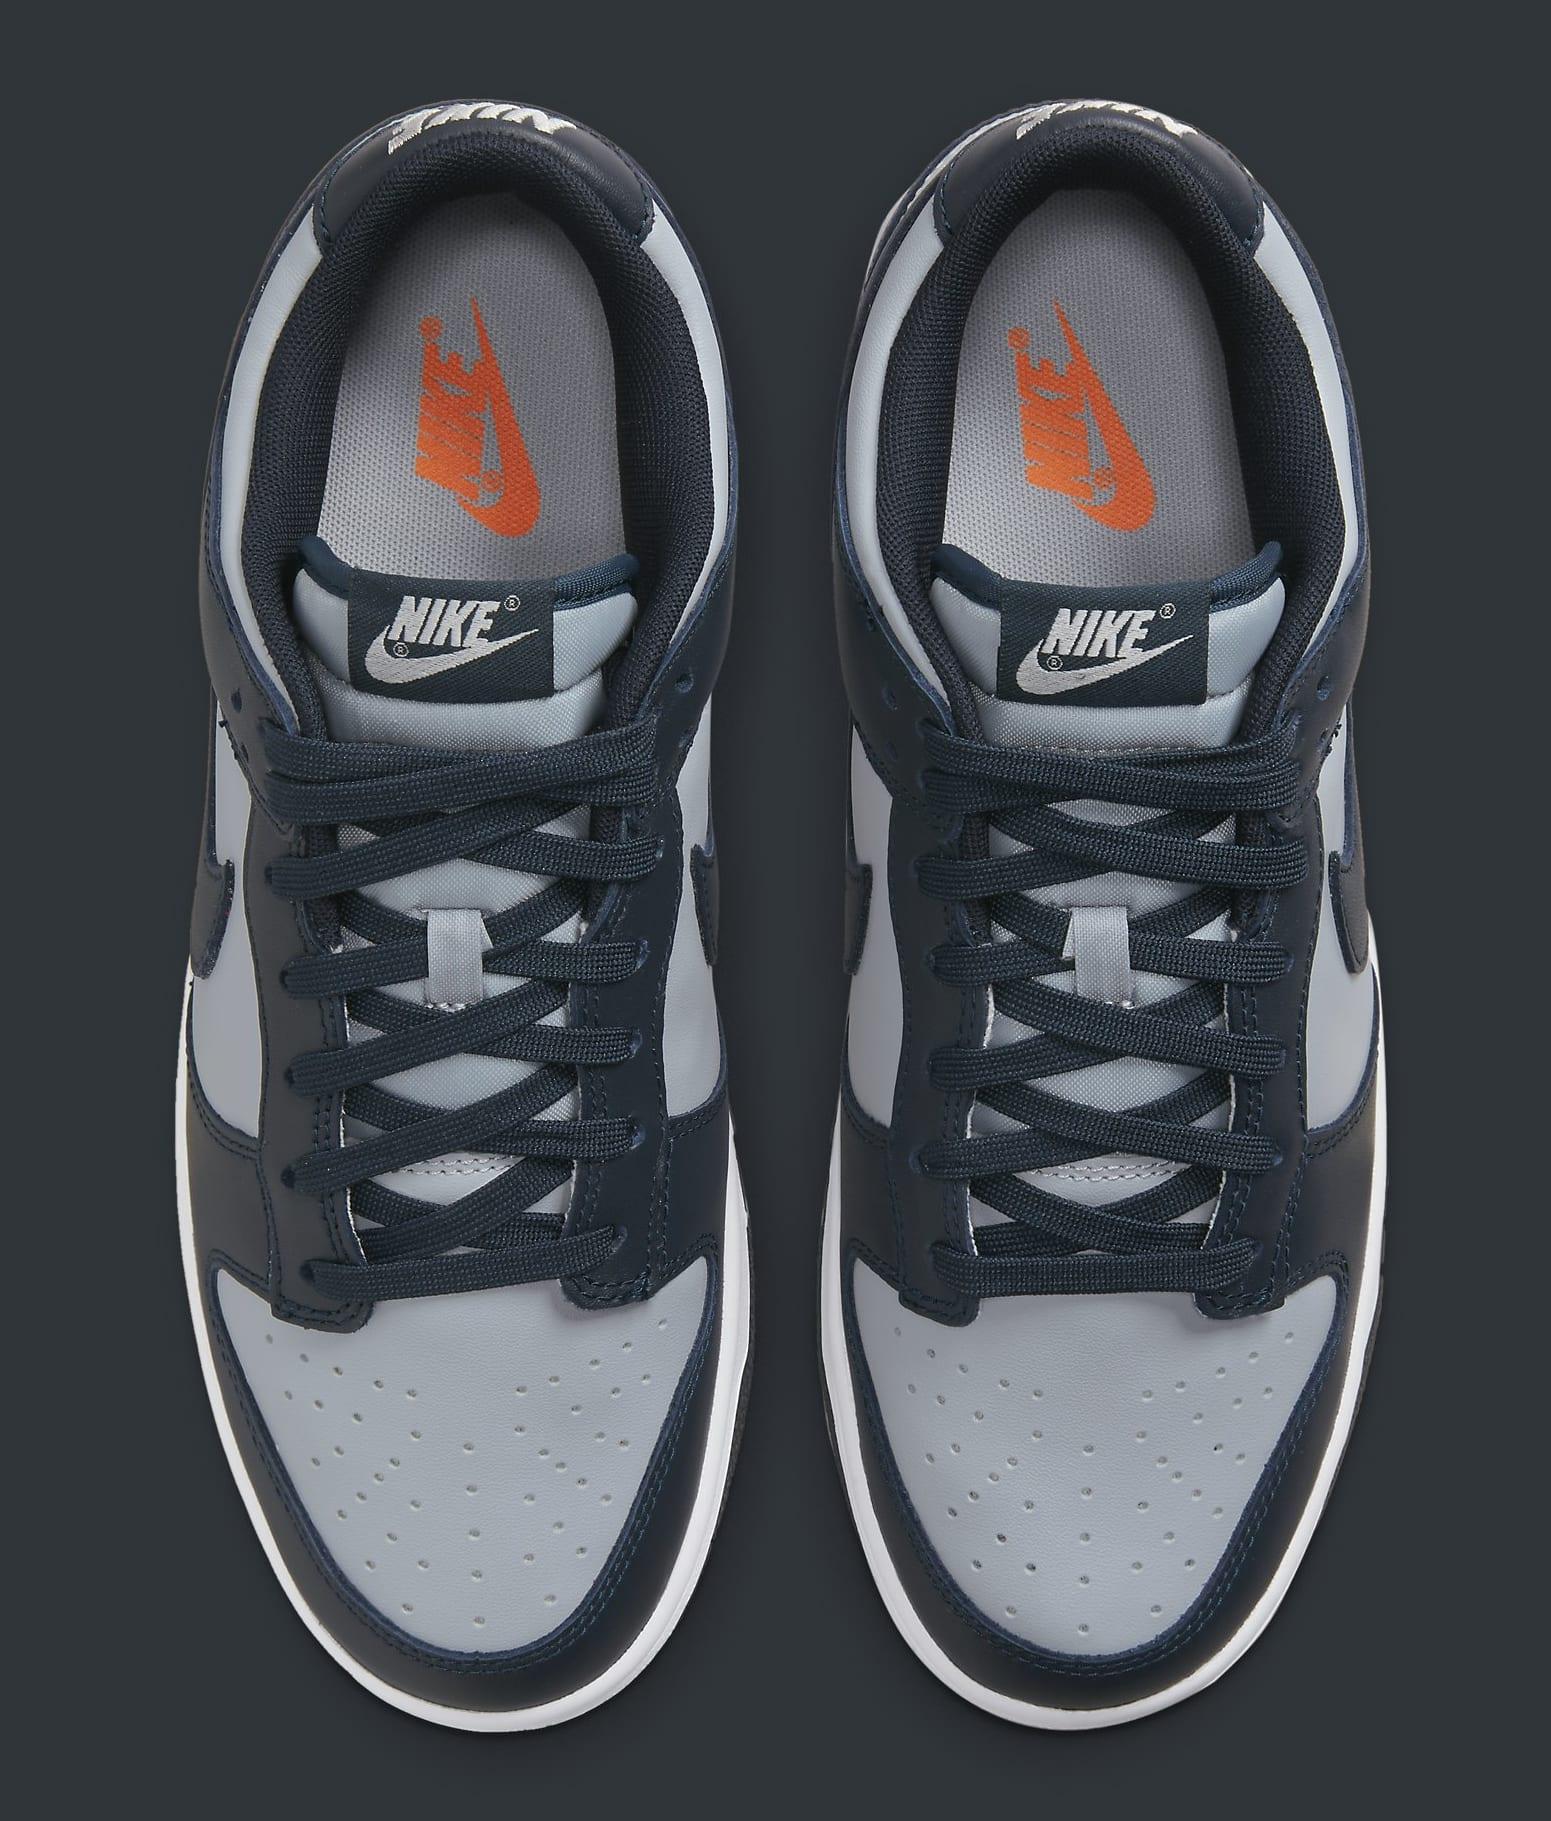 Nike Dunk Low 'Georgetown' DD1391-003 Top